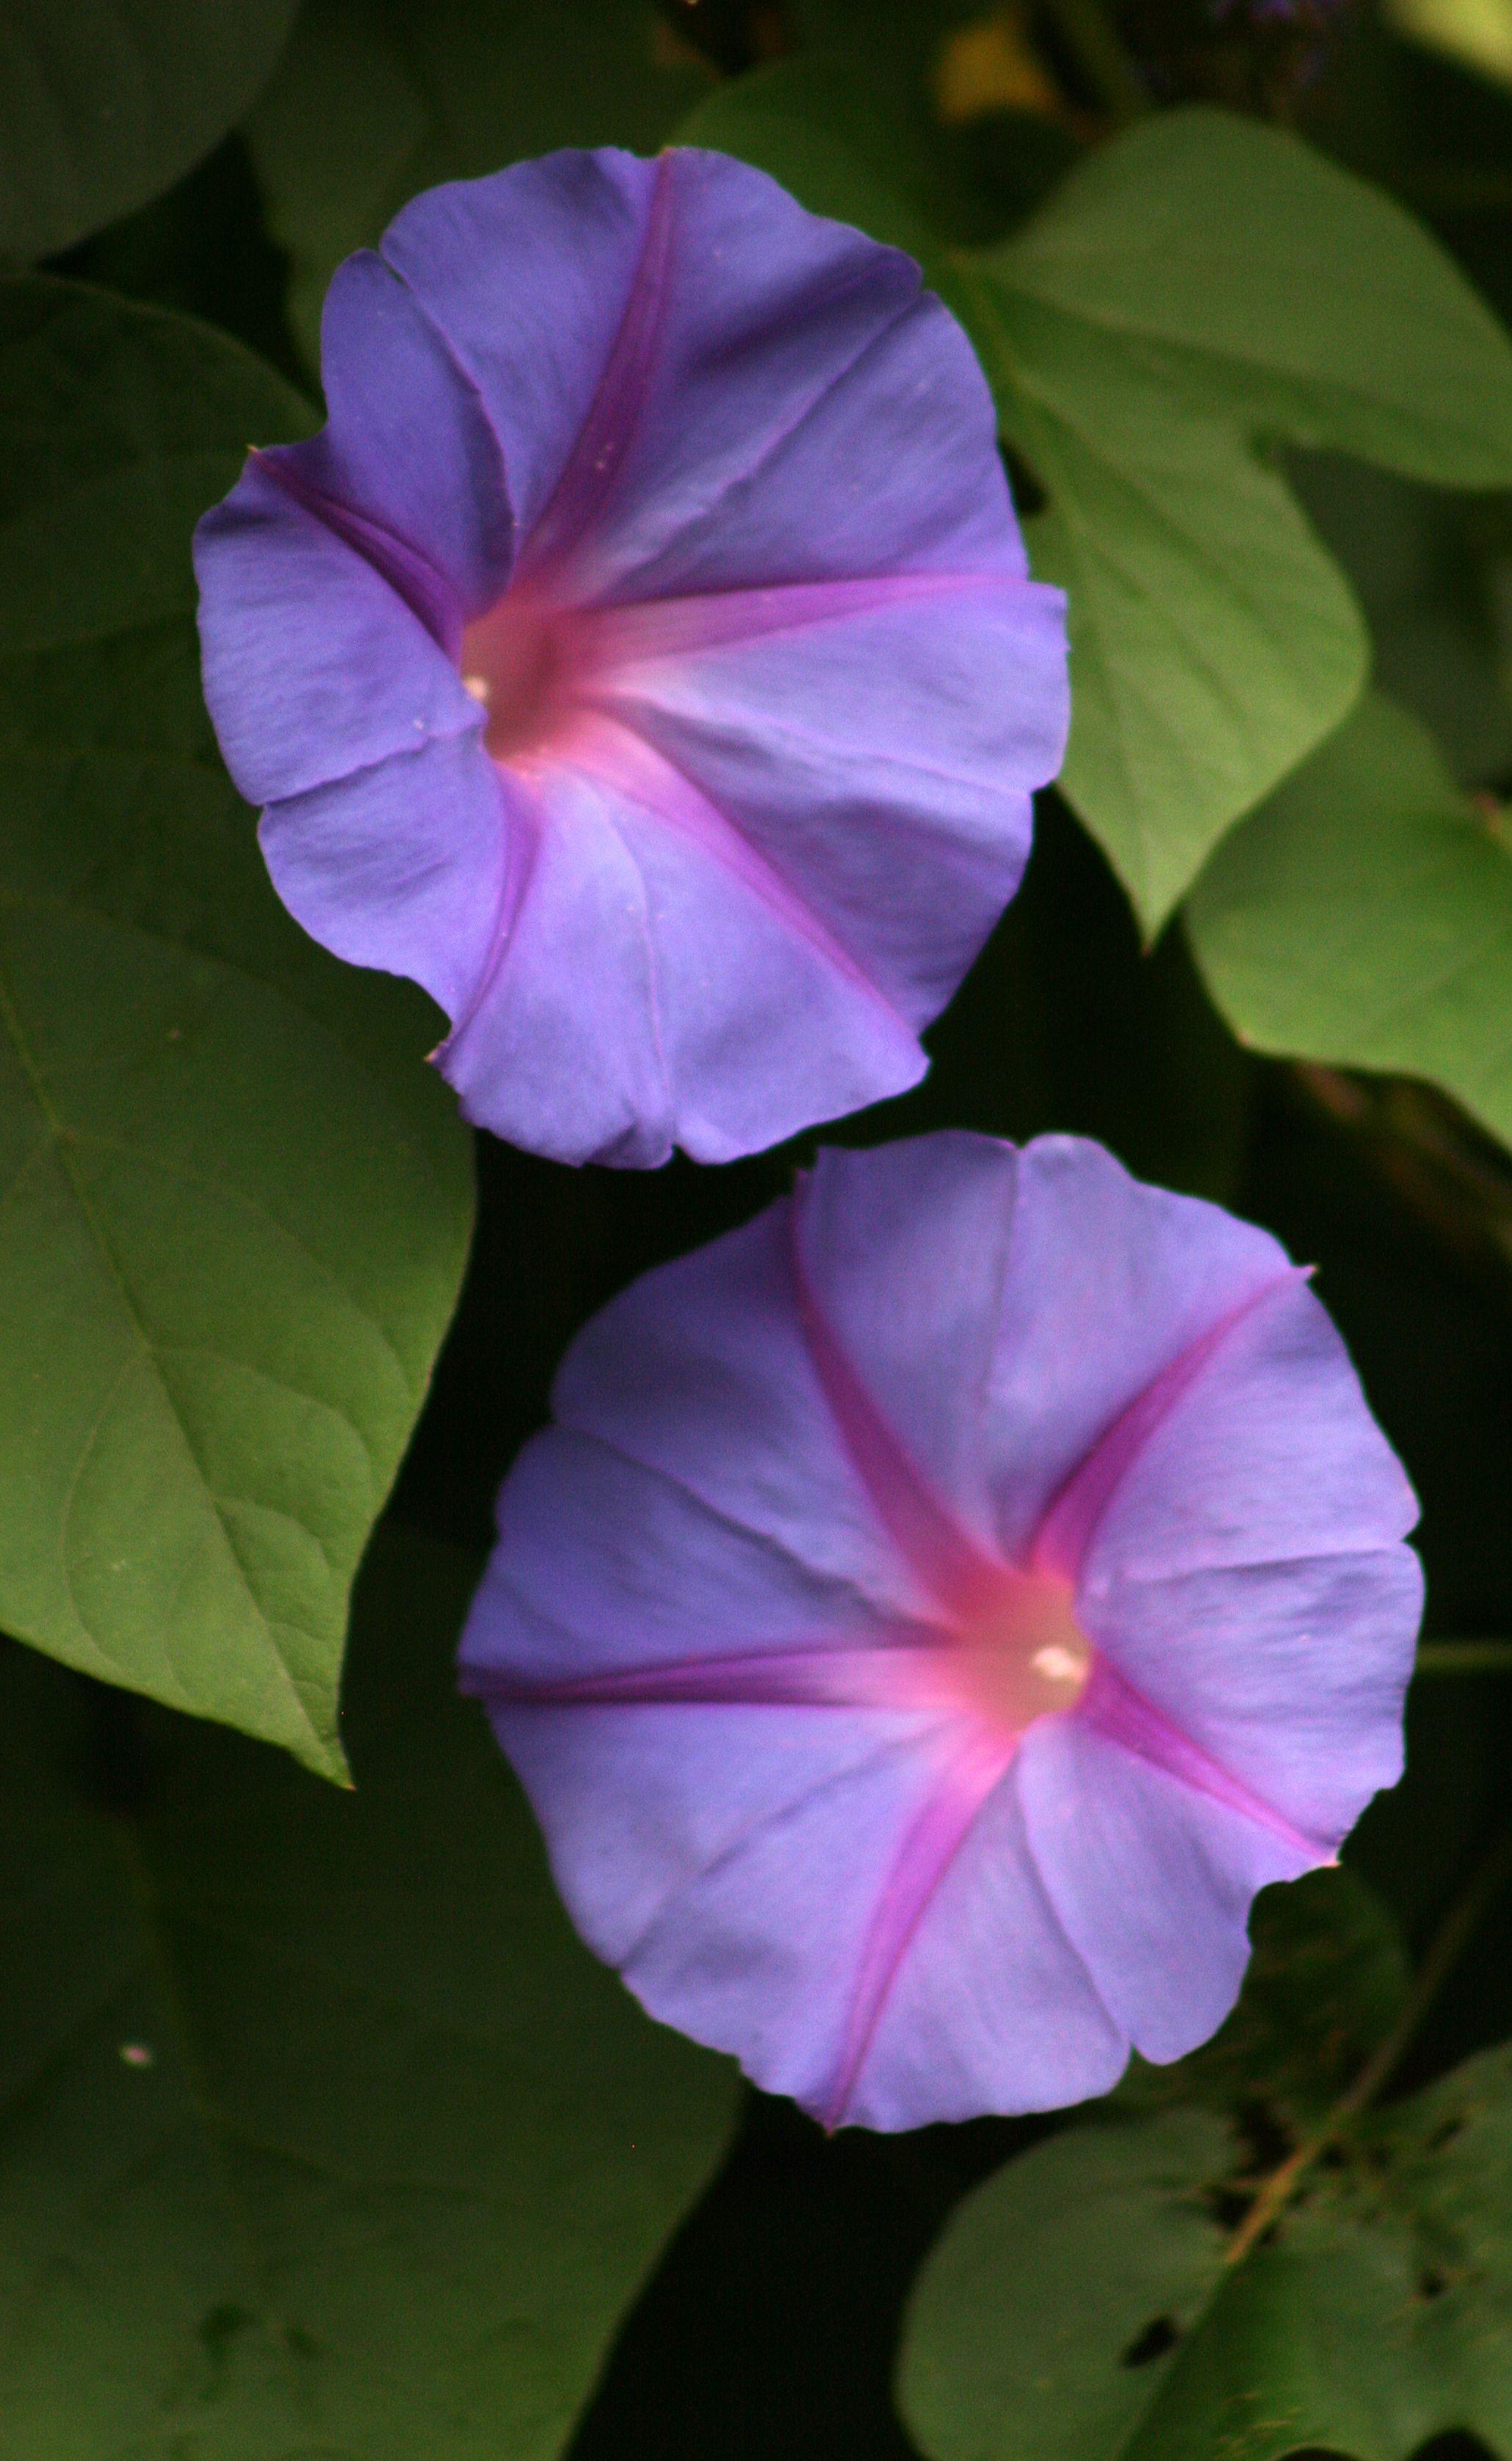 Morning Glory Morning Glory Flowers Purple Flowers Amazing Flowers